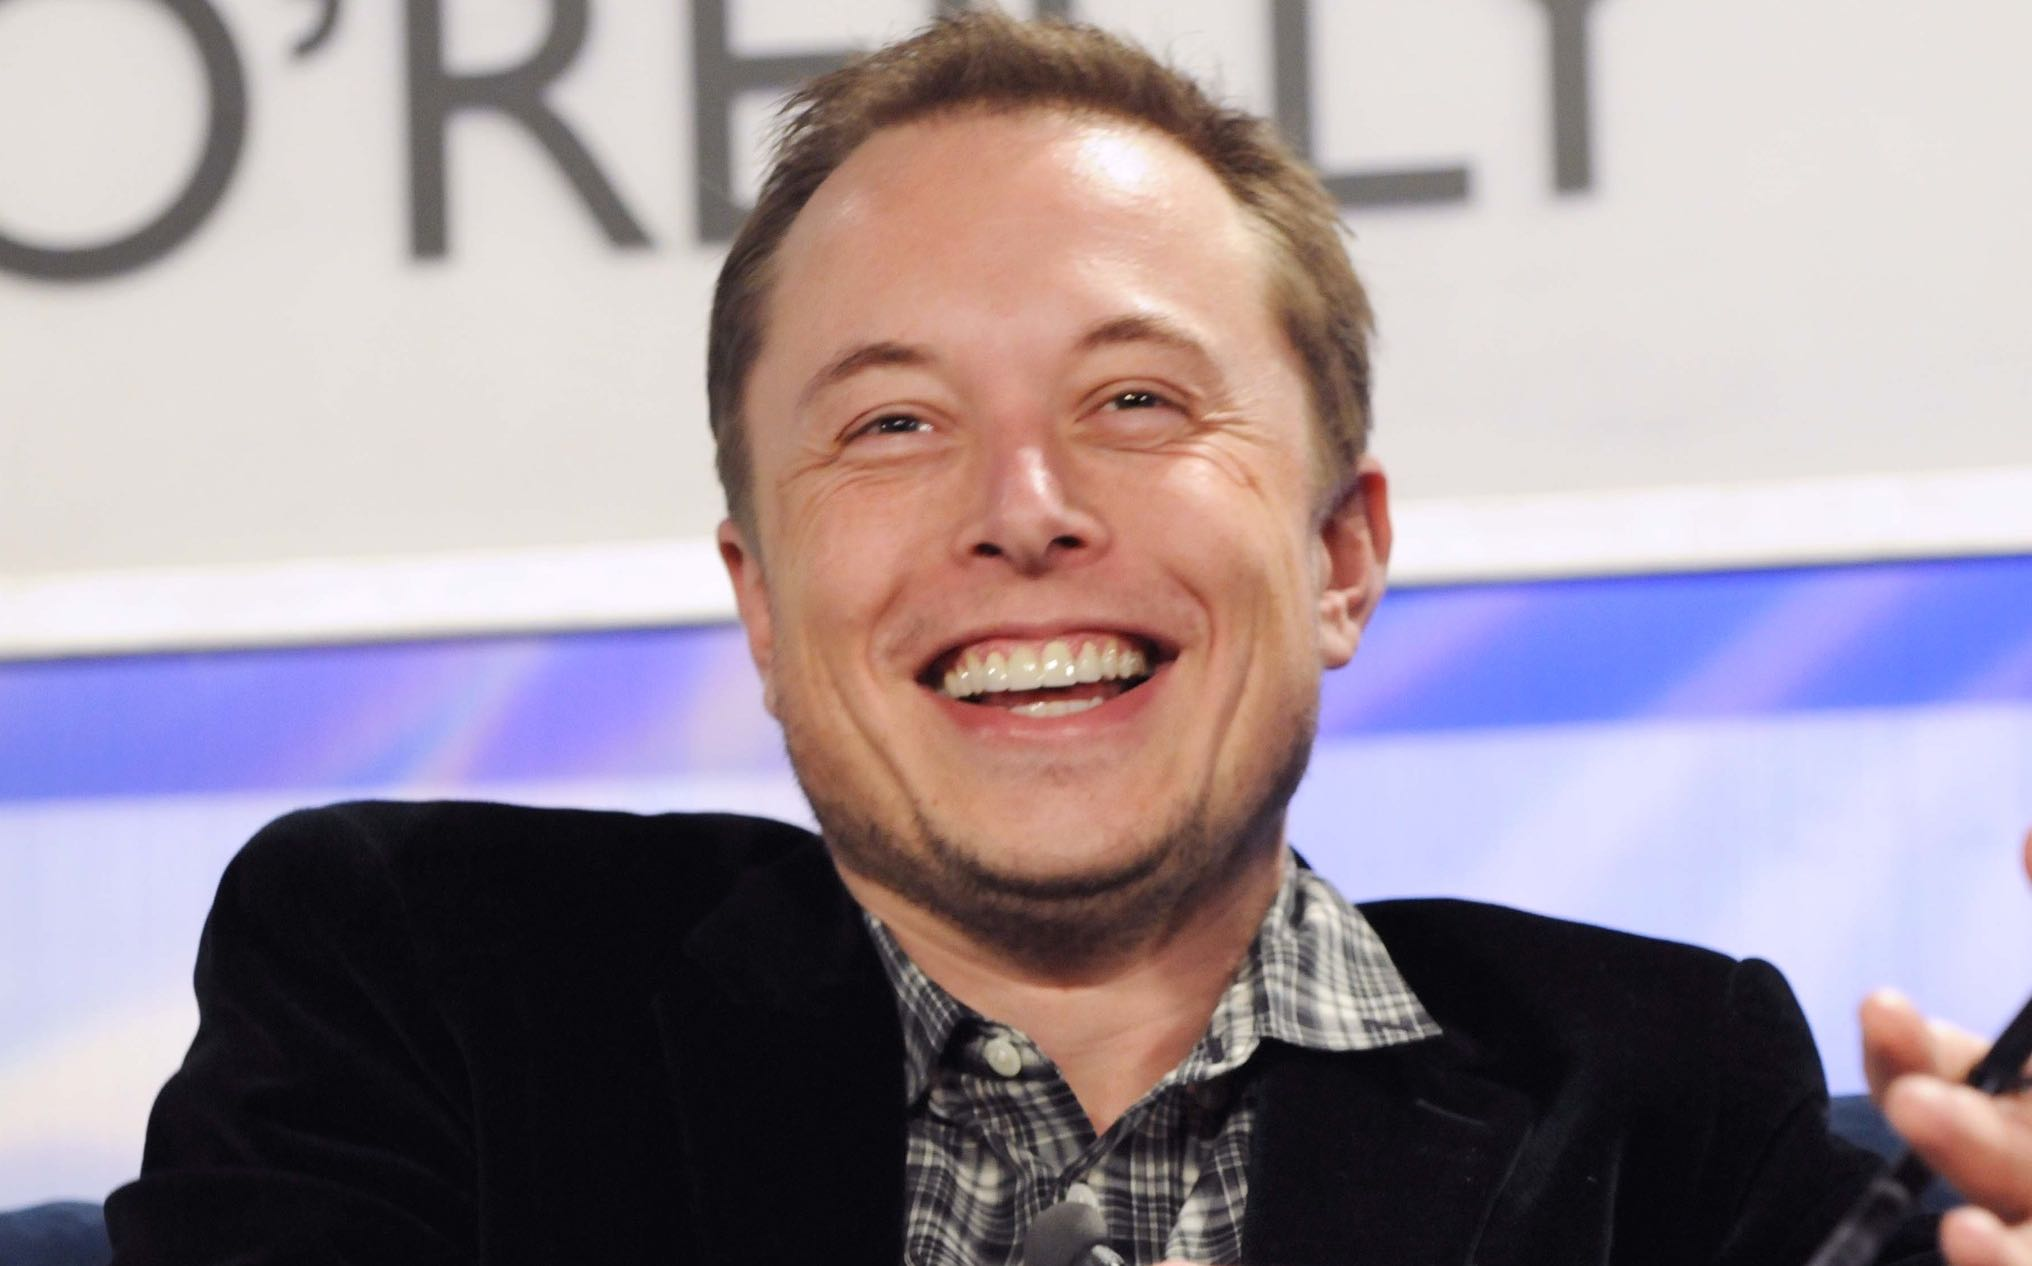 Elon Musk Cajero ATM Bitcoin Tesla